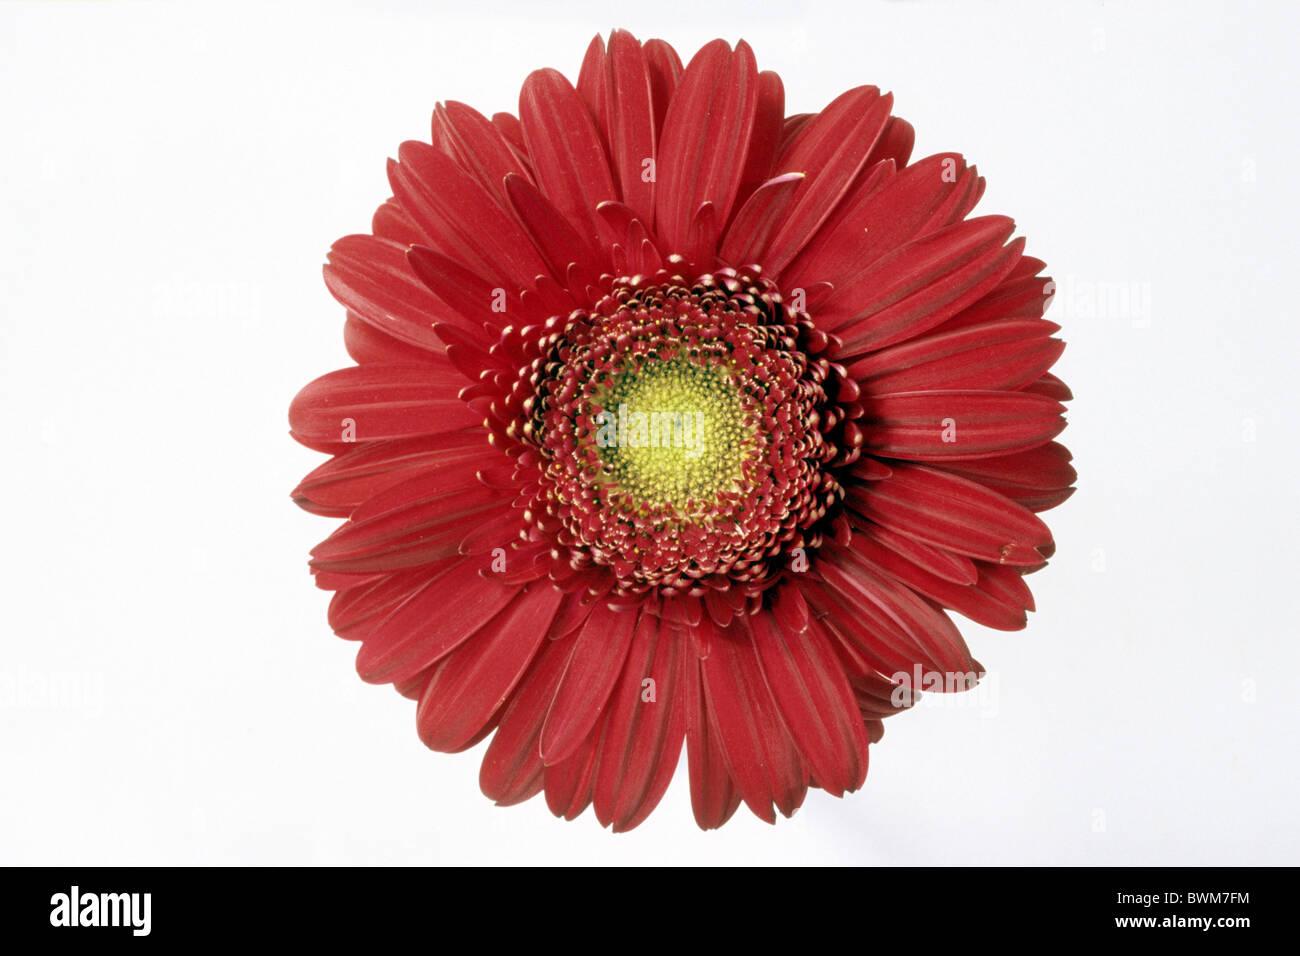 Gerbera (Gerbera-Hybride), rote Blüte, Studio Bild. Stockbild